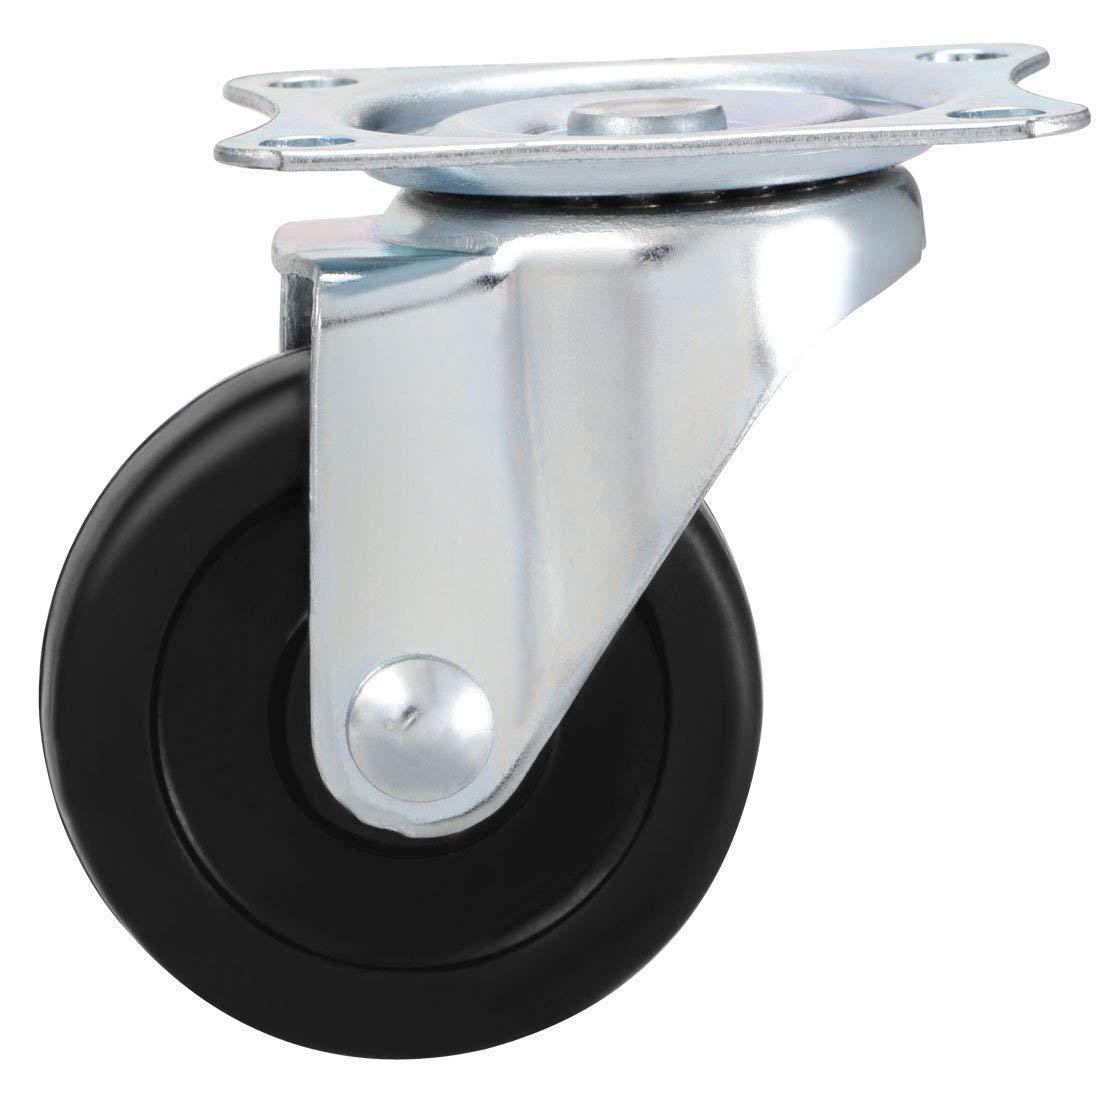 FactorDuty Swivel Caster Wheels Rubber Base with Top Plate /& Bearing Heavy Duty Pack of 24 Black 1.5 NO Brake